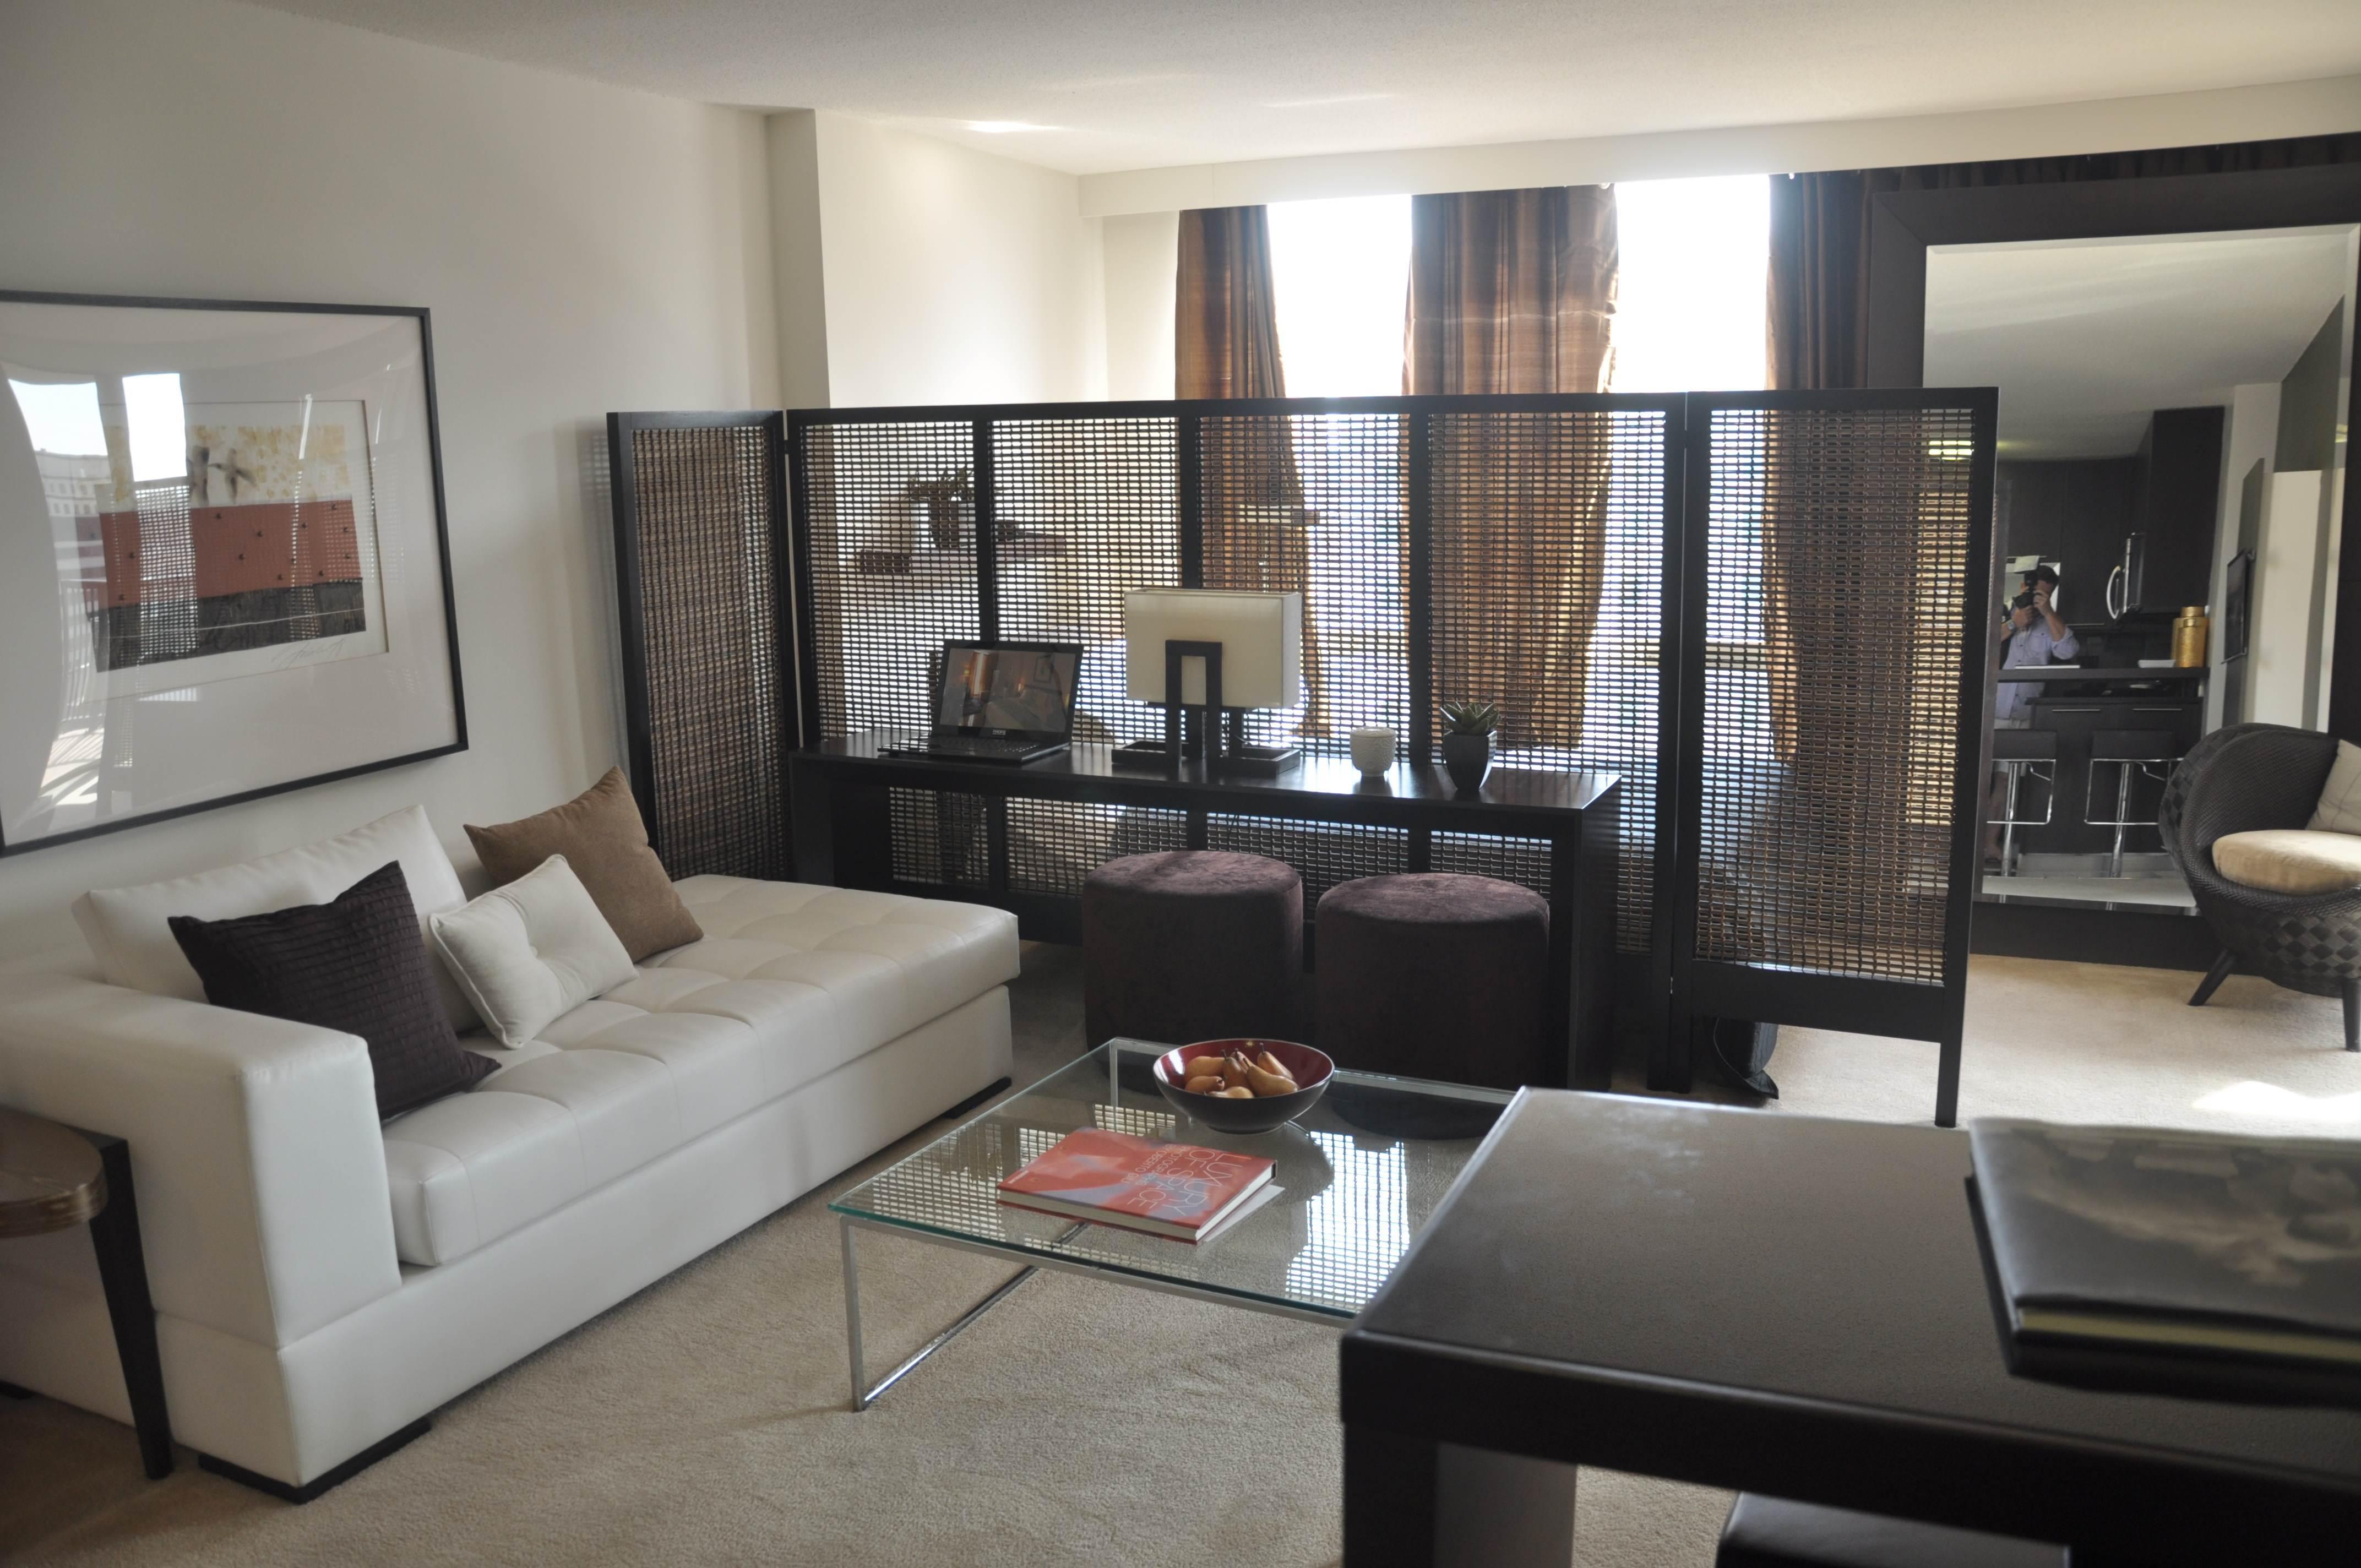 10 Fantastic Decorating Ideas For Studio Apartment studio apartments decorating 5 studio apartment layouts that just 2020